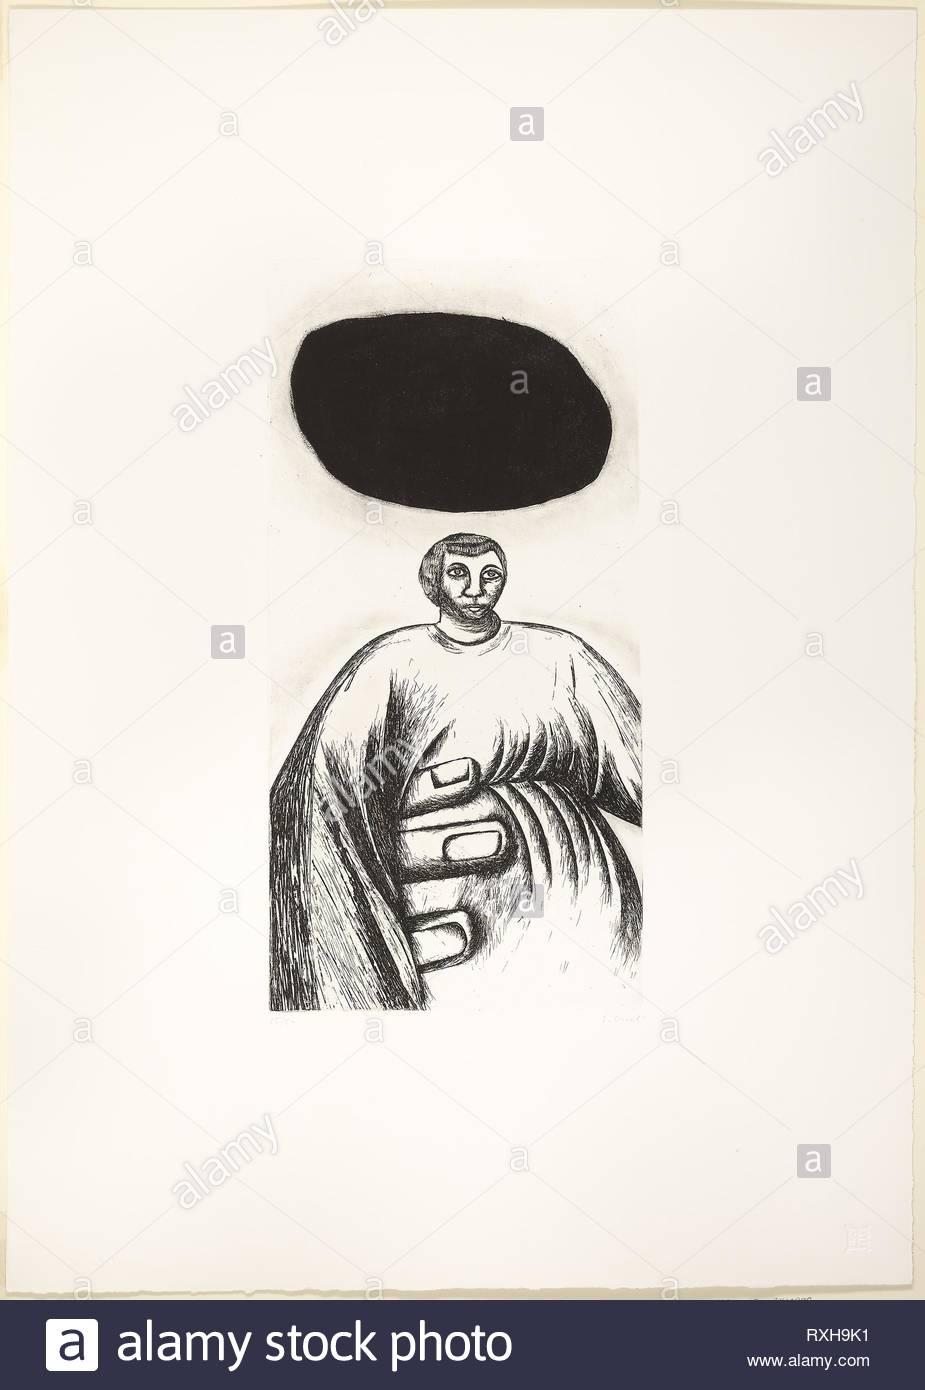 La Mano di Pietra. Enzo Cucchi; Italian, born 1949. Date: 1982. Dimensions: 495 x 245 mm (image/plate); 848 x 598 mm (sheet). Drypoint and mezzotint on white wove paper. Origin: Italy. Museum: The Chicago Art Institute. - Stock Image